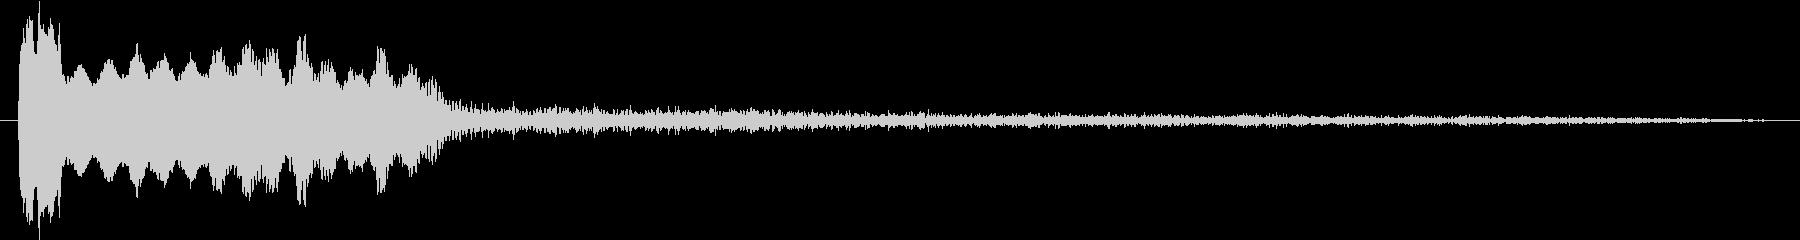 SF的な移動音の未再生の波形